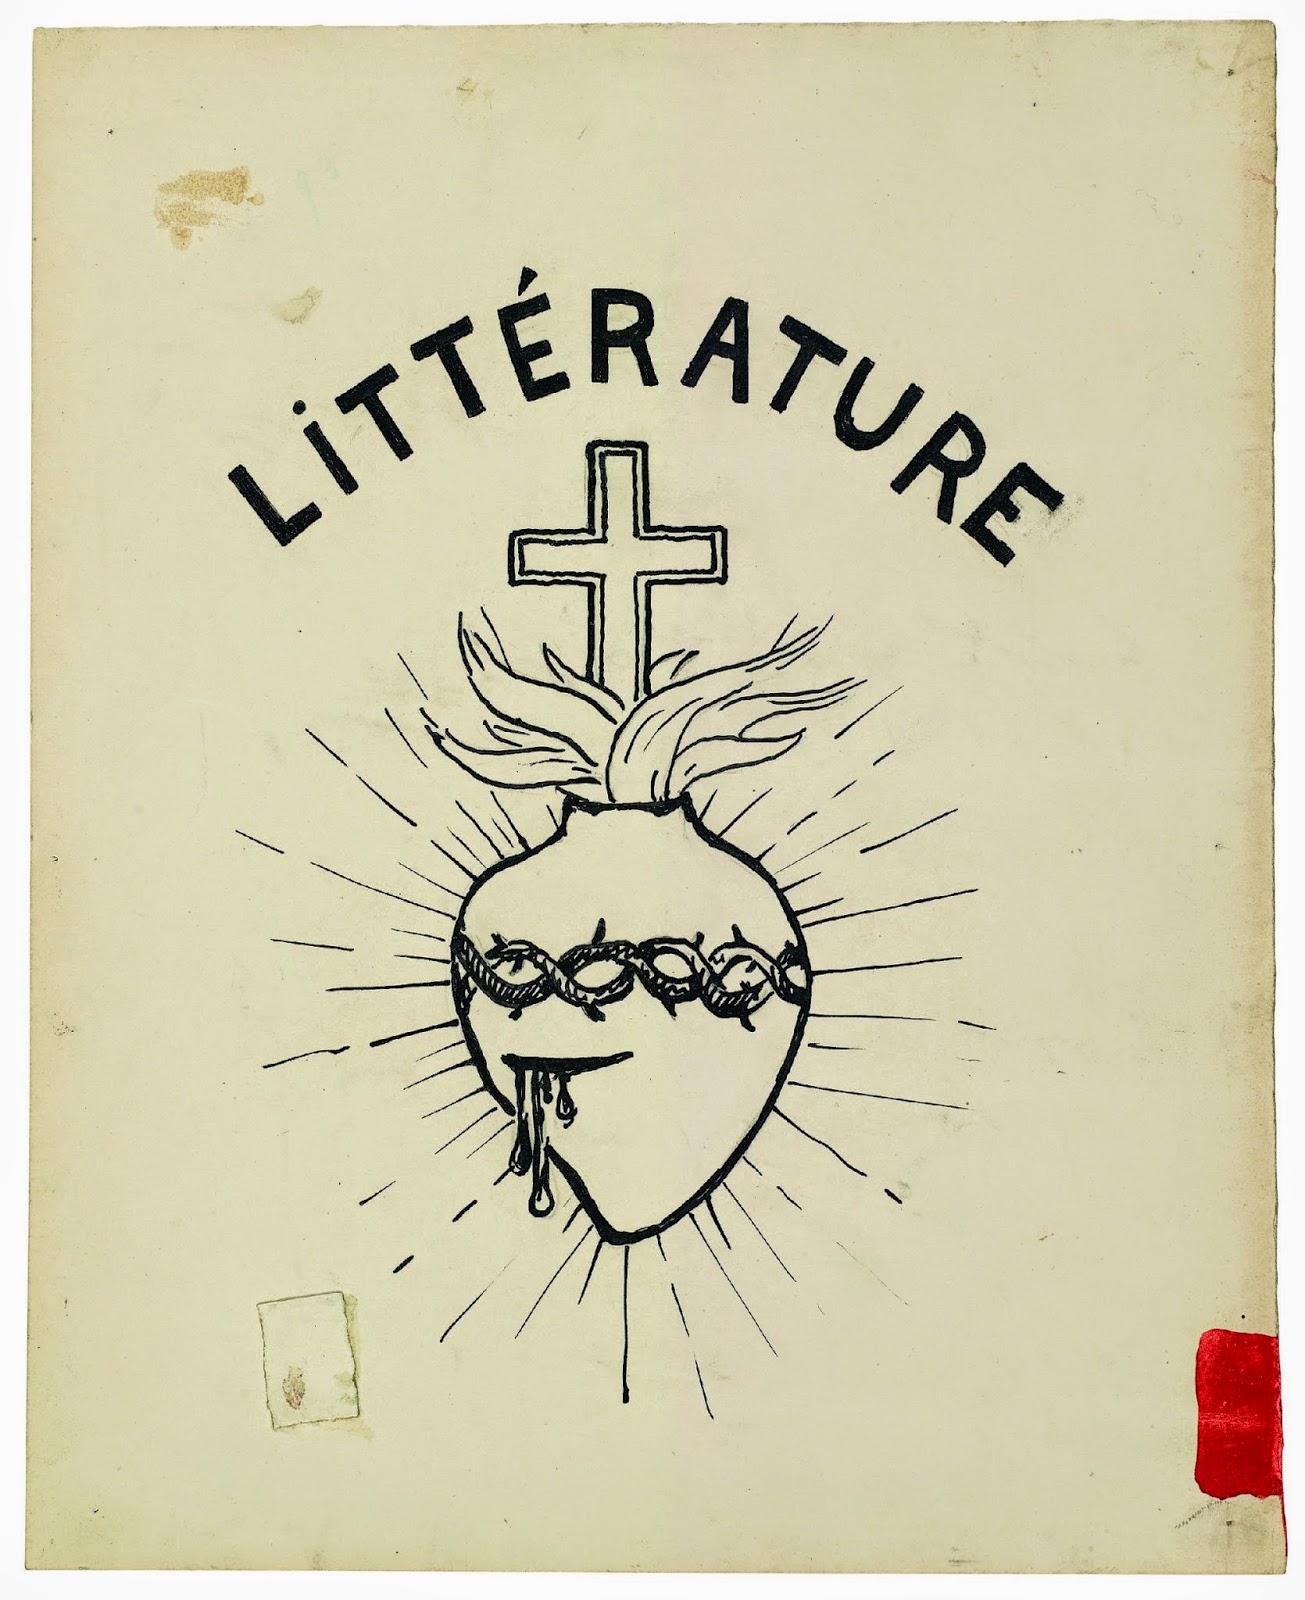 003. Picabia Litt rArgos